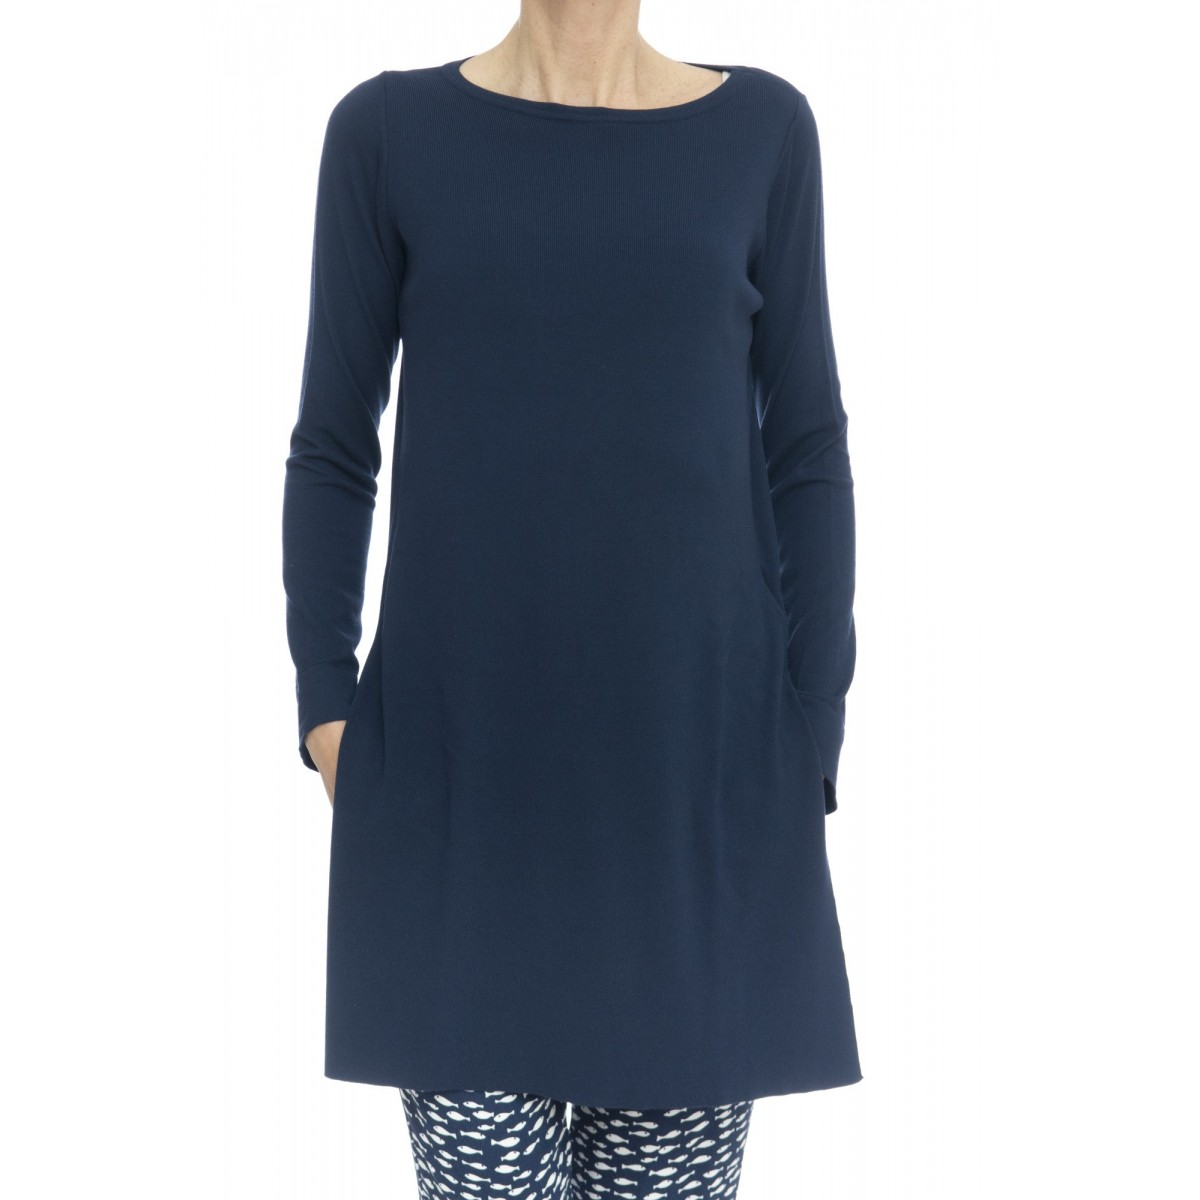 Maglieria - 145021 maglia lunga